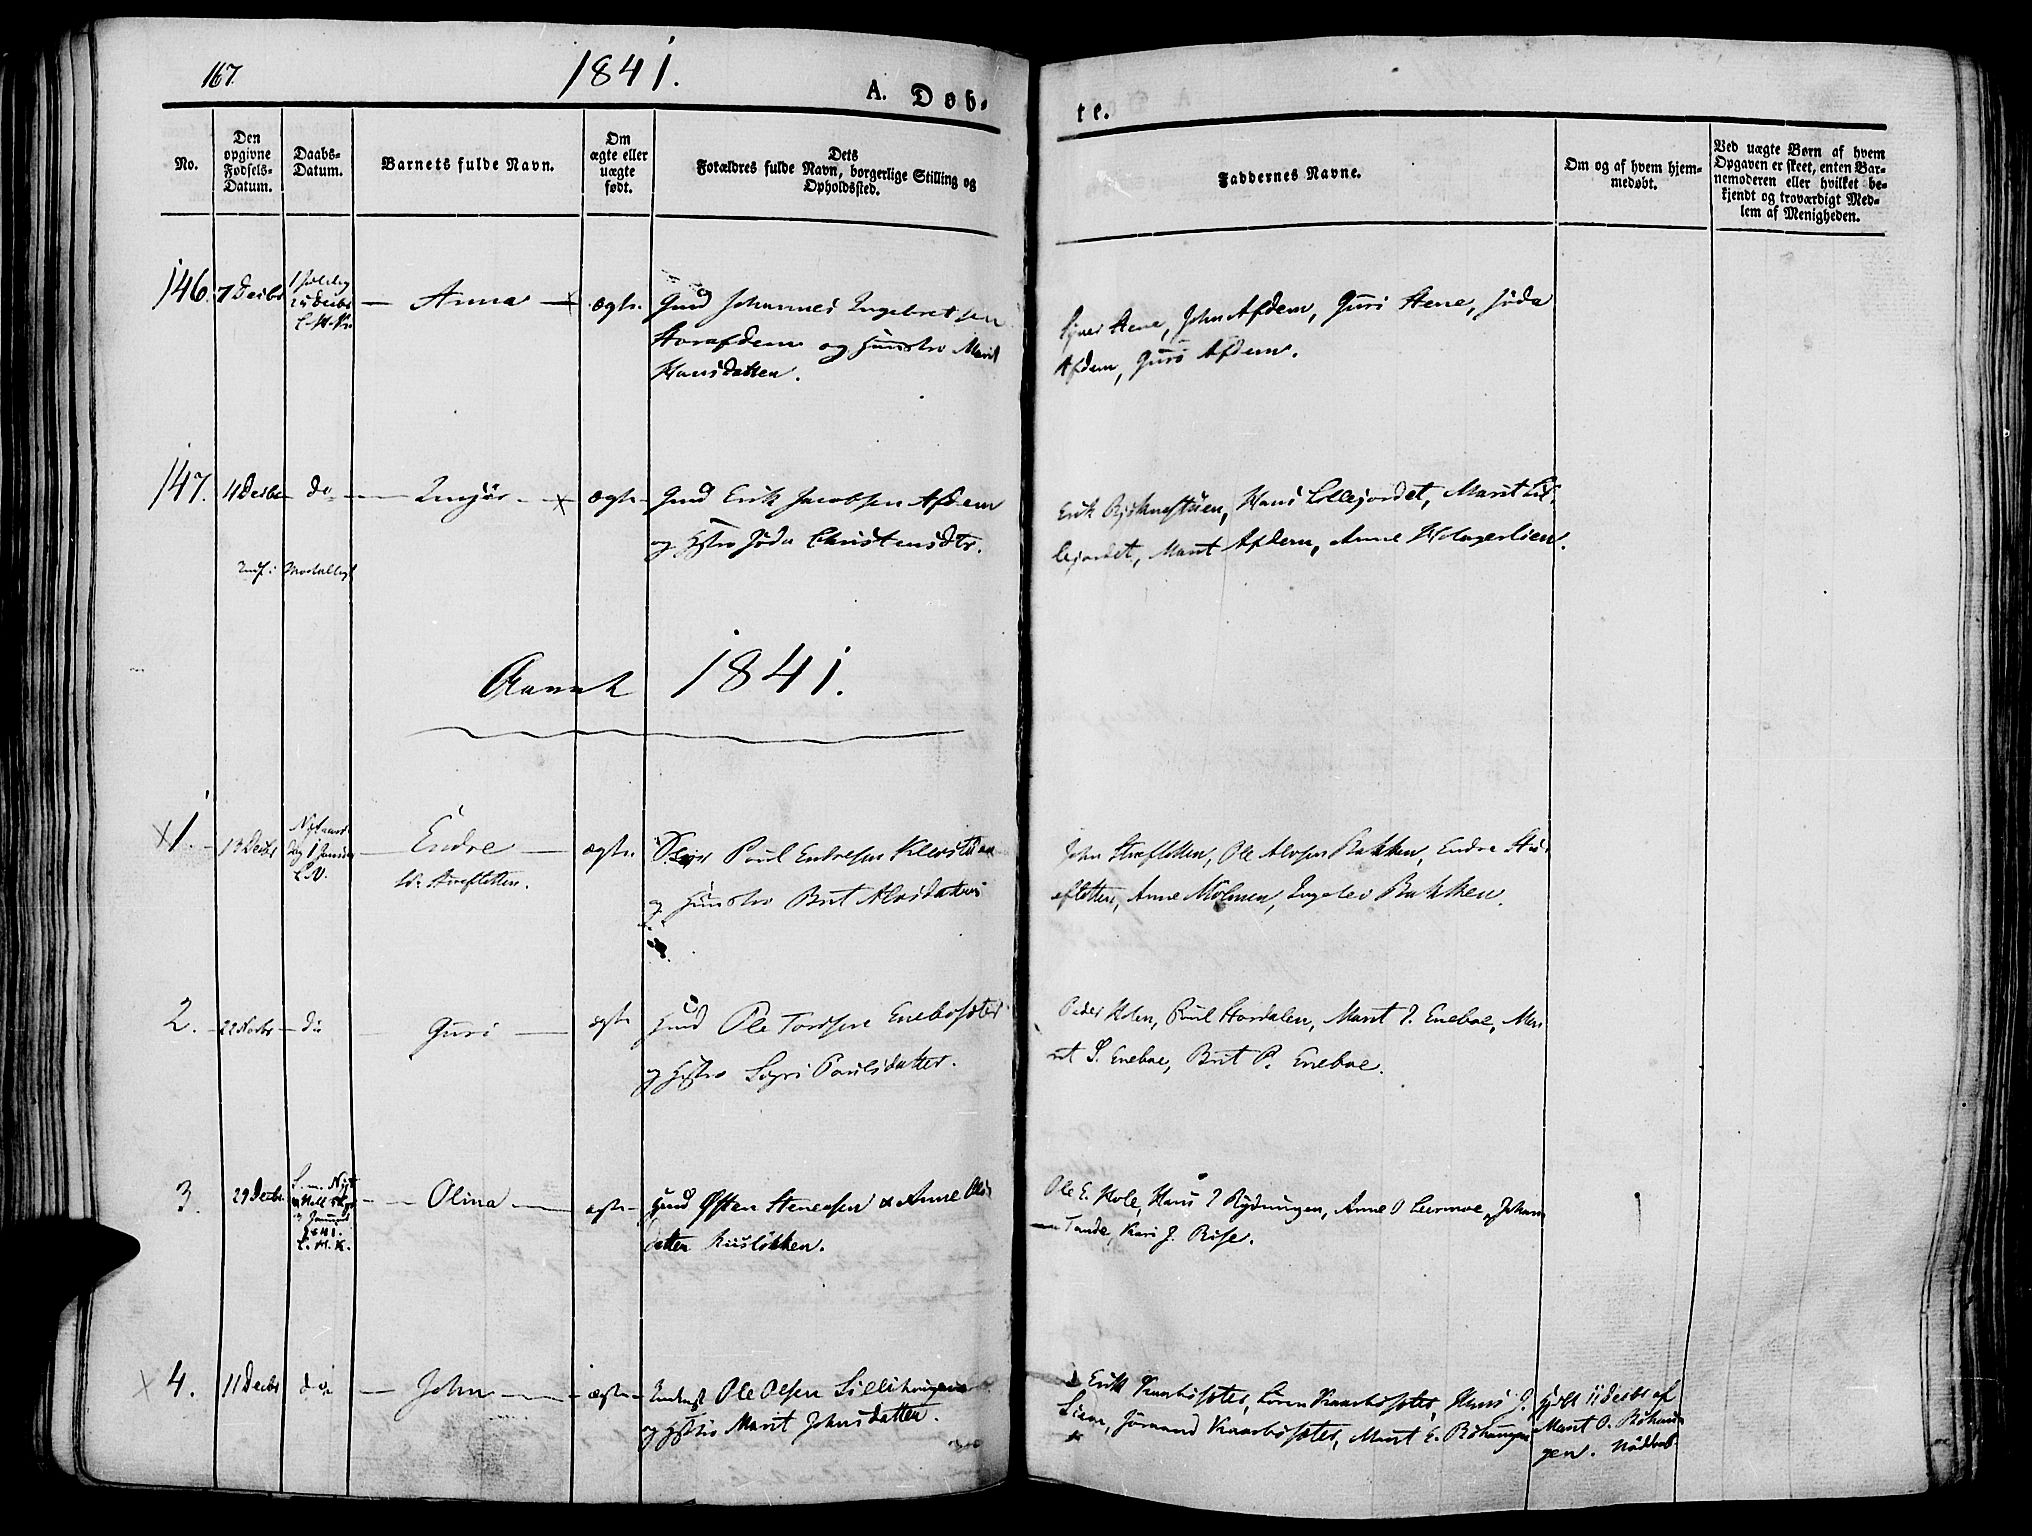 SAH, Lesja prestekontor, Ministerialbok nr. 5, 1830-1842, s. 167